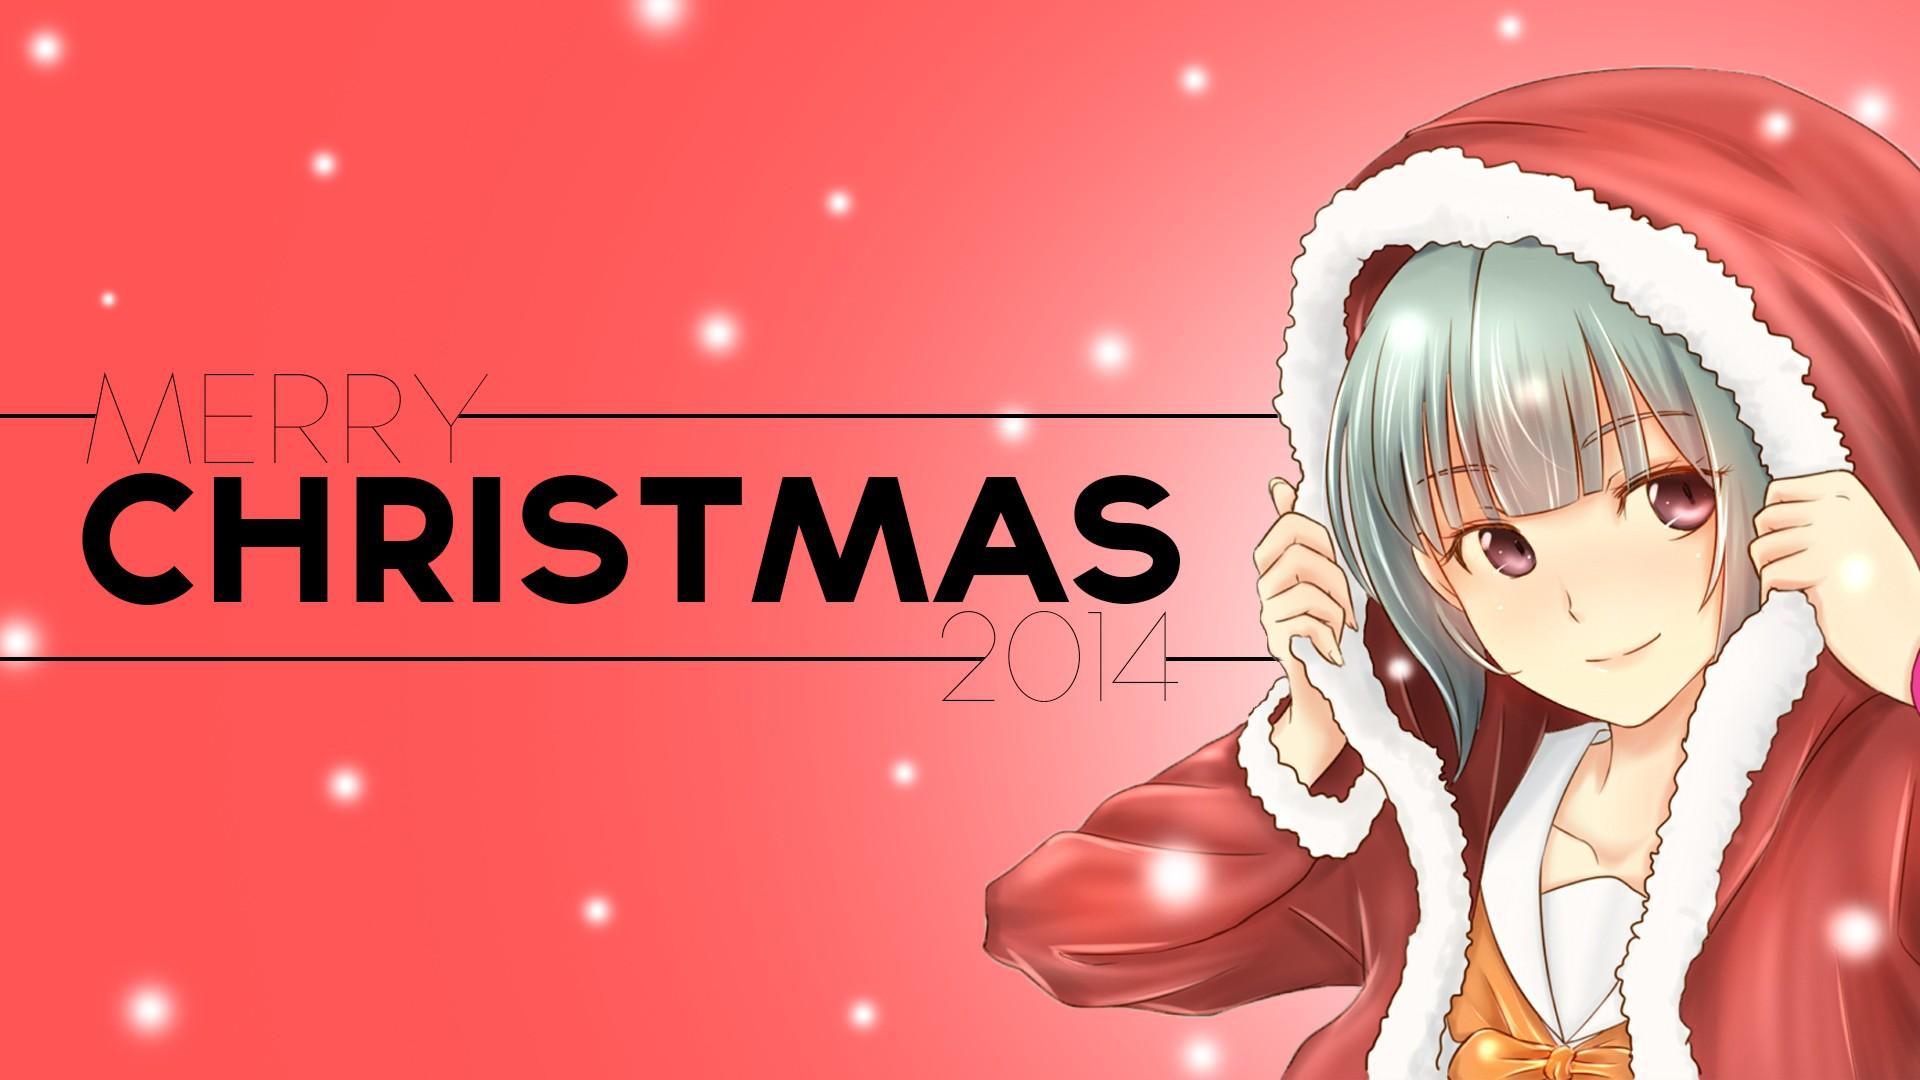 Anime Christmas Wallpaper.Wallpaper Illustration Anime Girls Red Cartoon Kantai